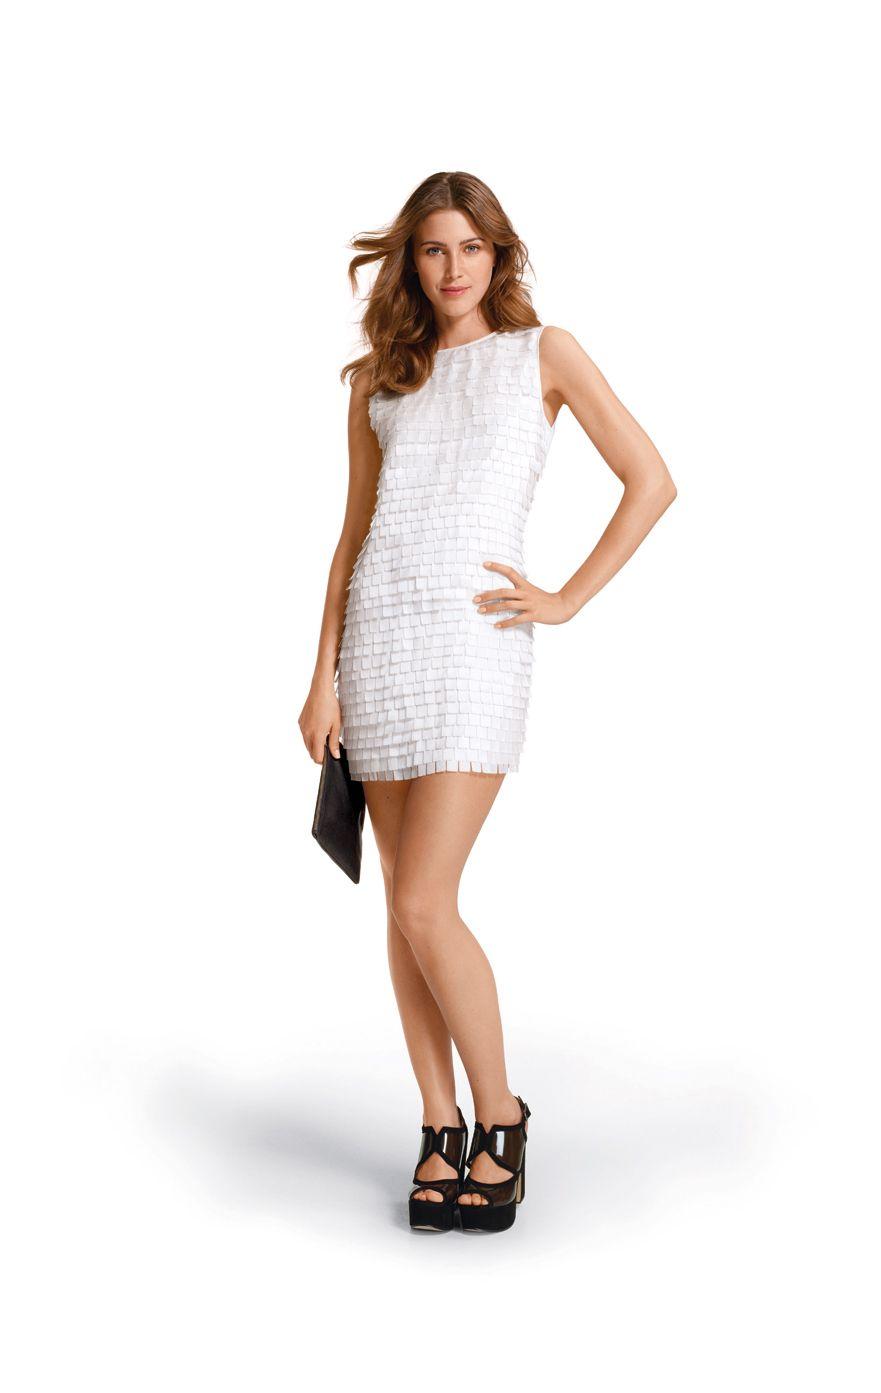 dressed in black & white. #style #blackwhite #dress #nivea